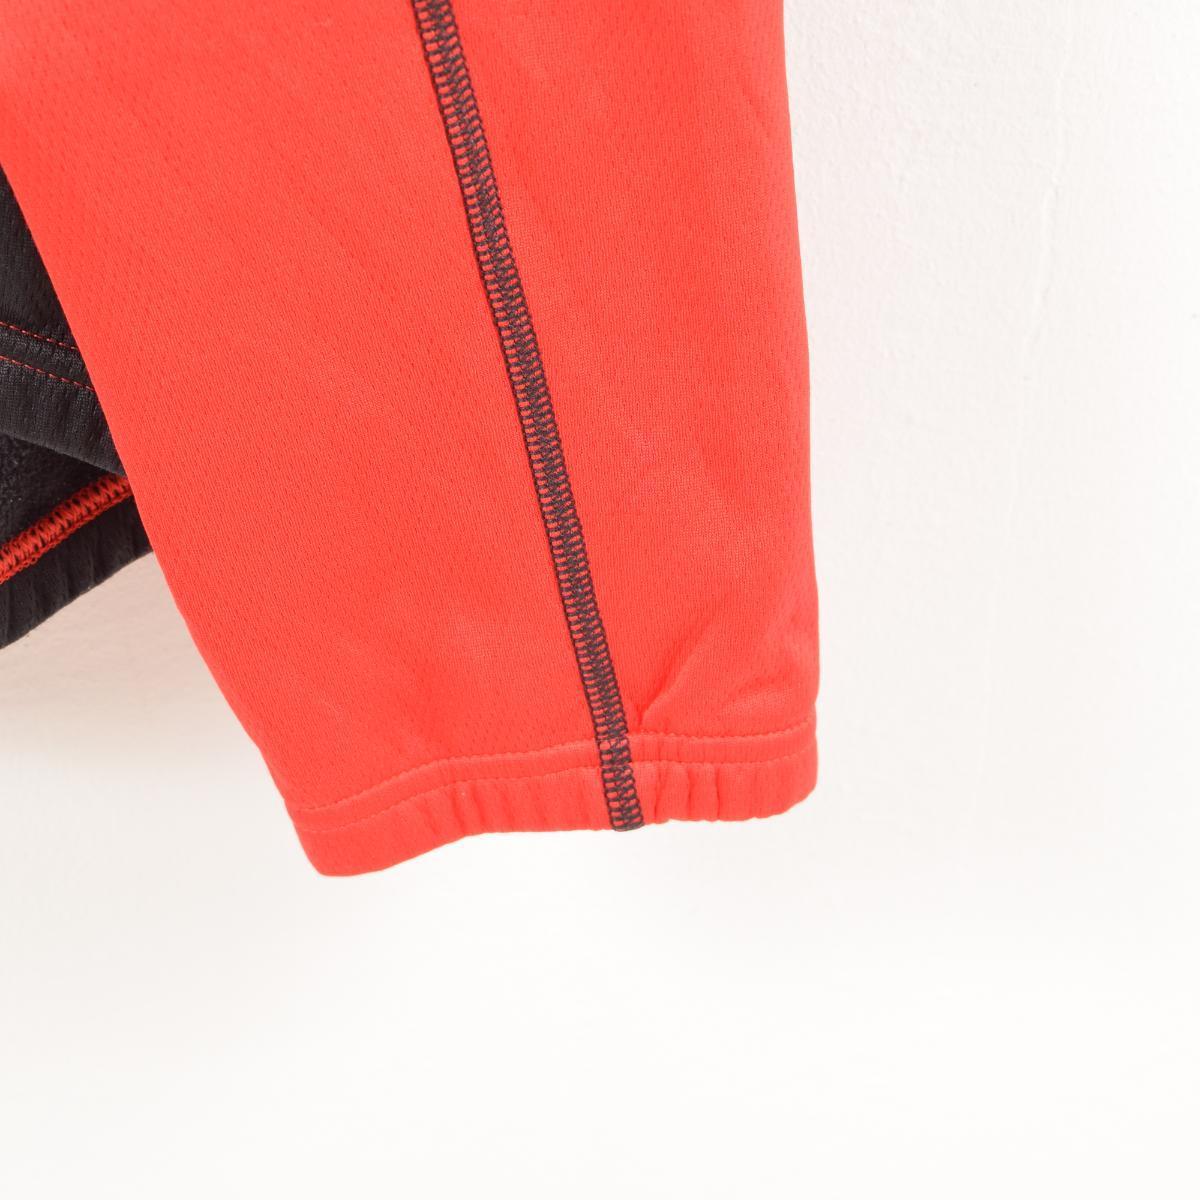 Adidas adidas jersey truck jacket men L was5449